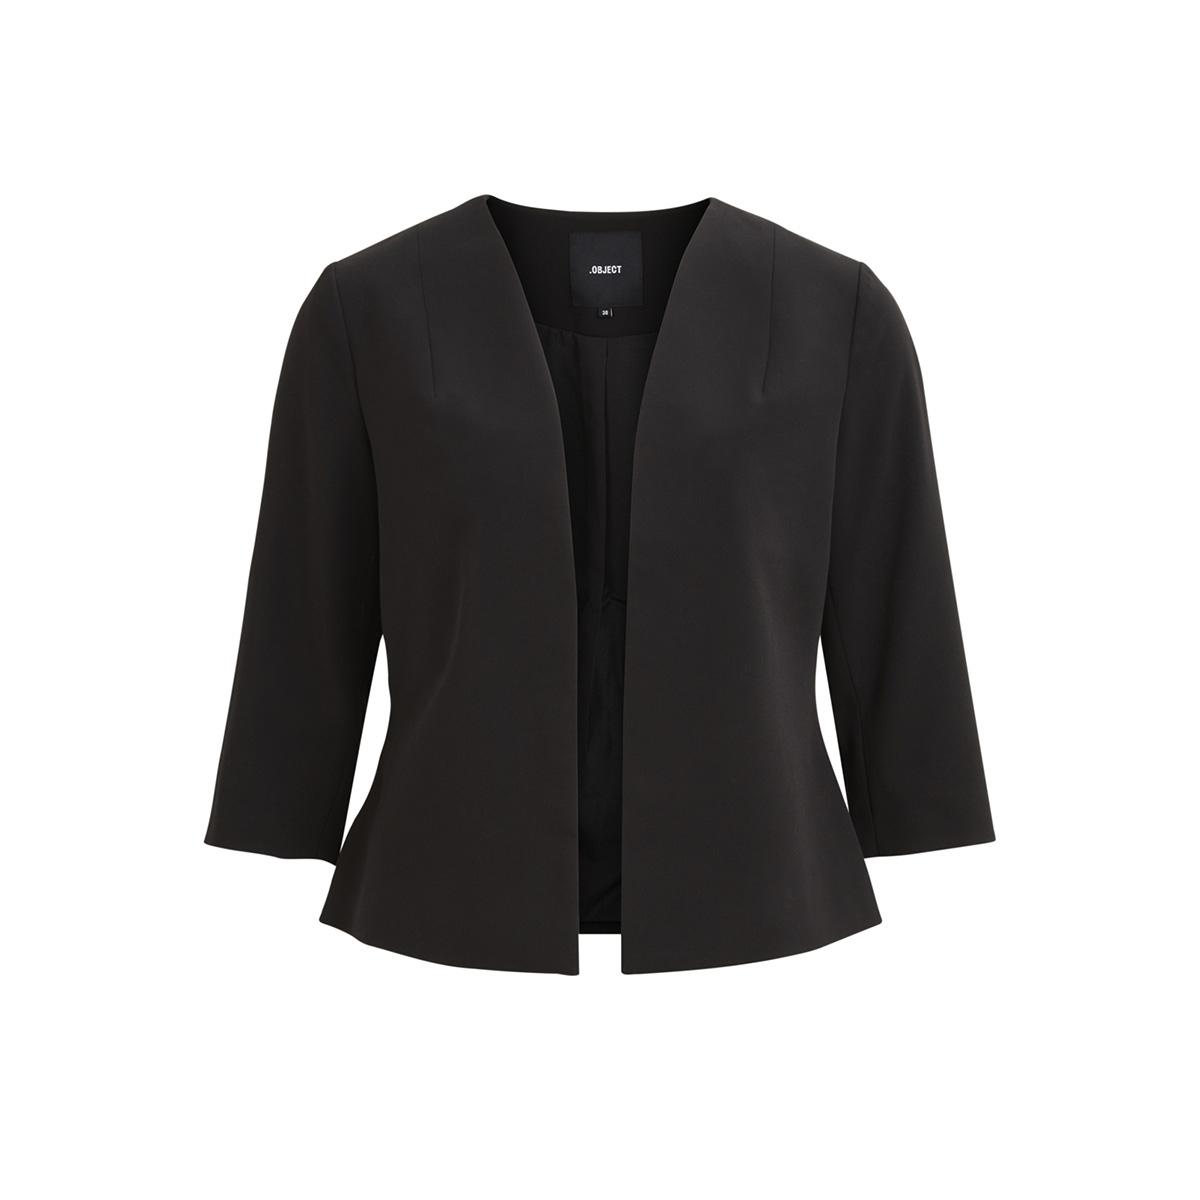 objcecilie blazer noos 23027421 object blazer black